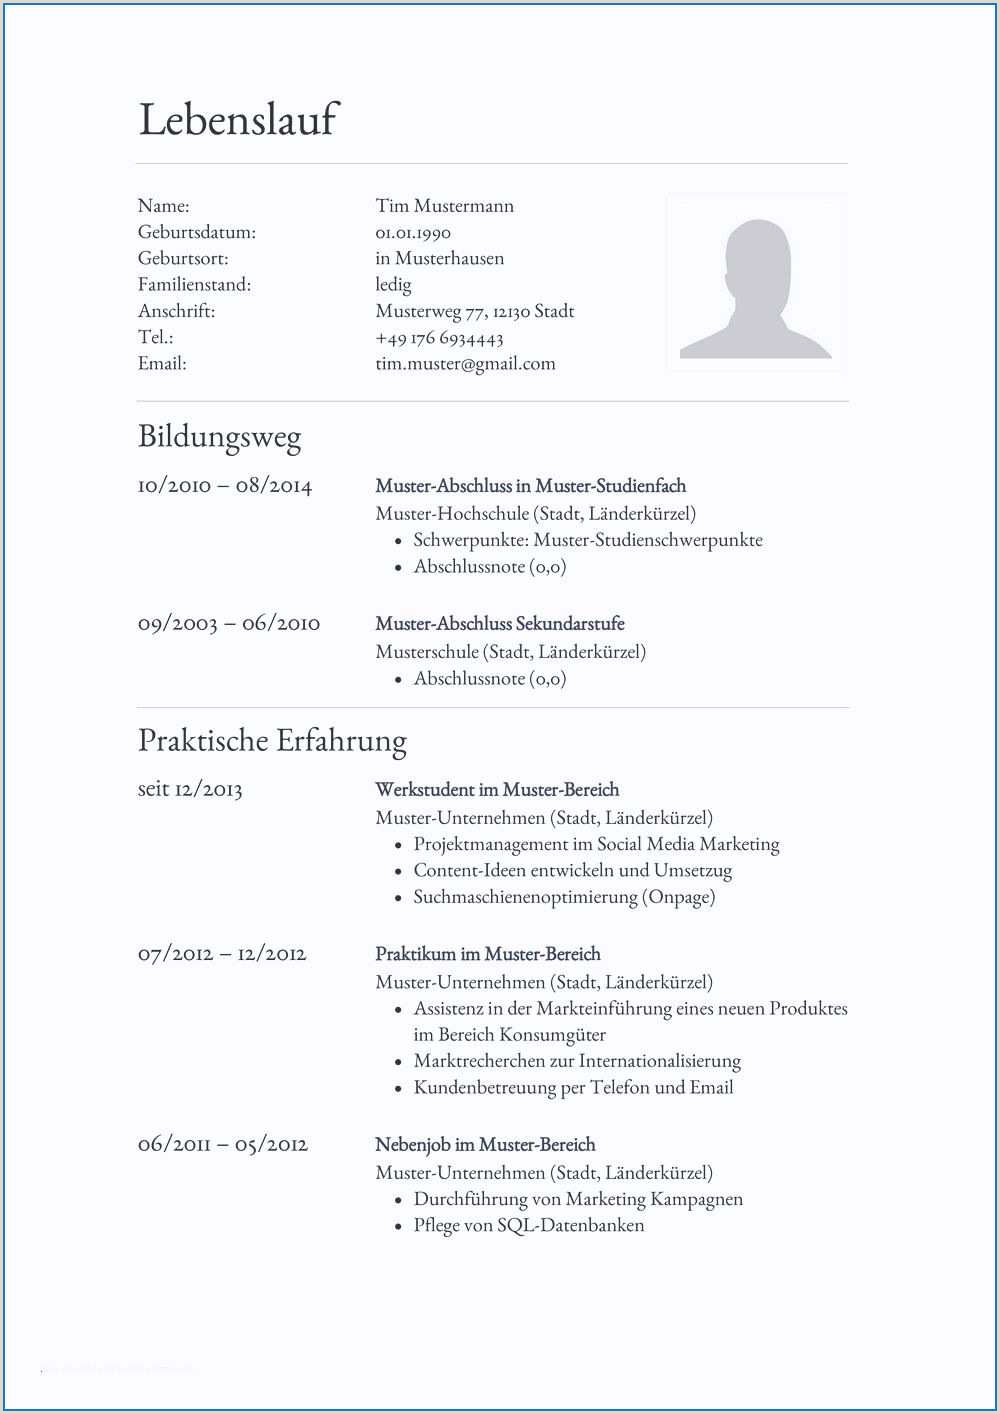 Lebenslauf Netzwerkadministrator Muster 39 New Release Ideas Lebenslauf Din 5008 Muster Kostenlos